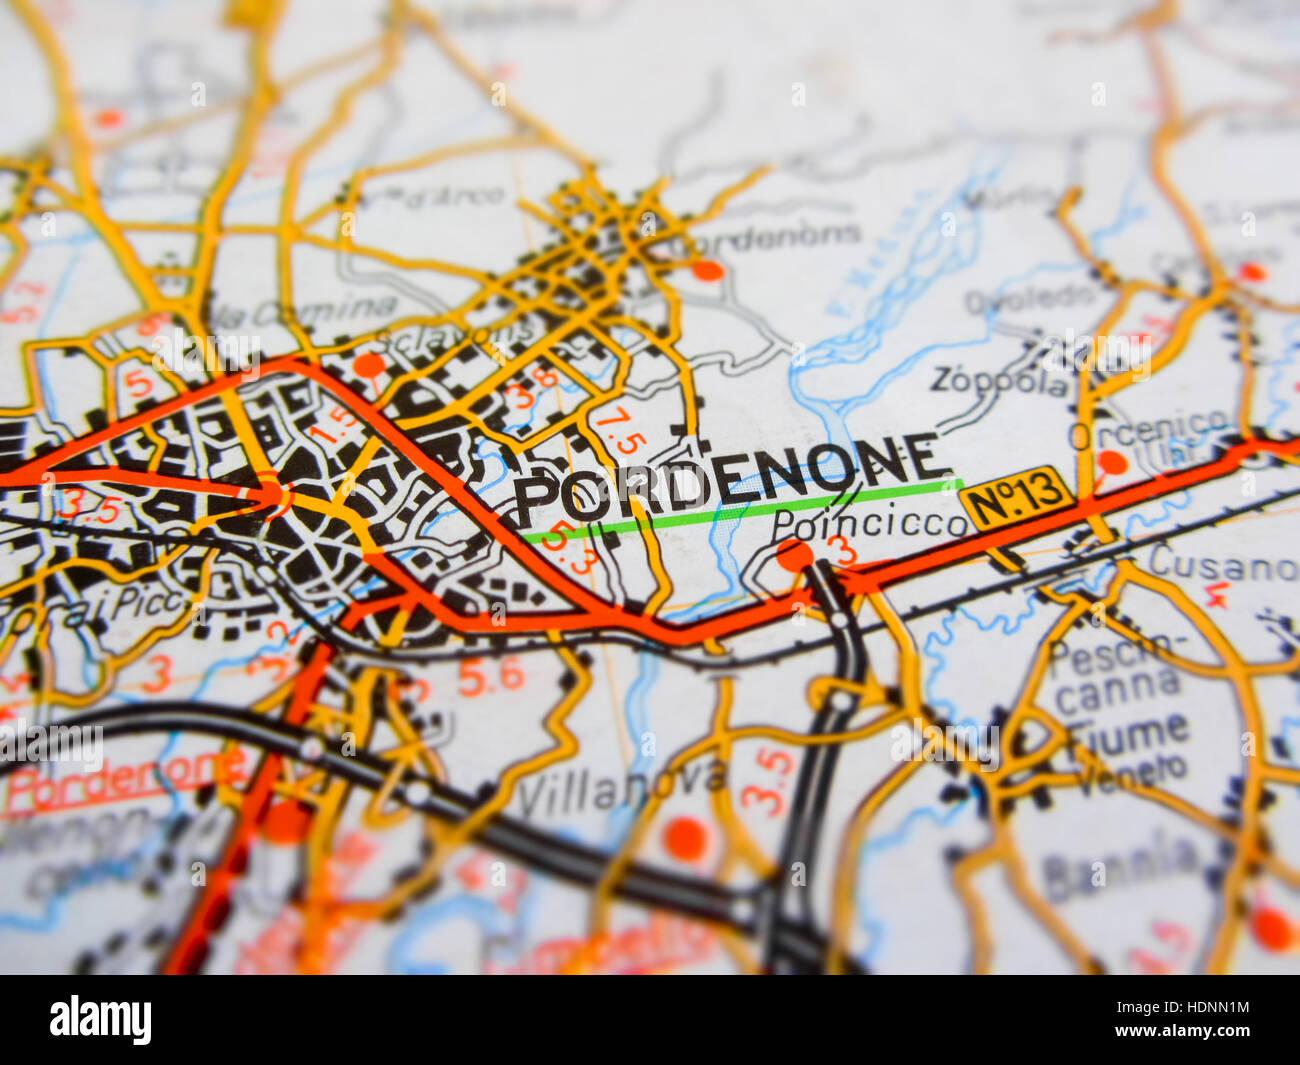 Pordenone City Over A Road Map Italy Stock Photo 128940608 Alamy